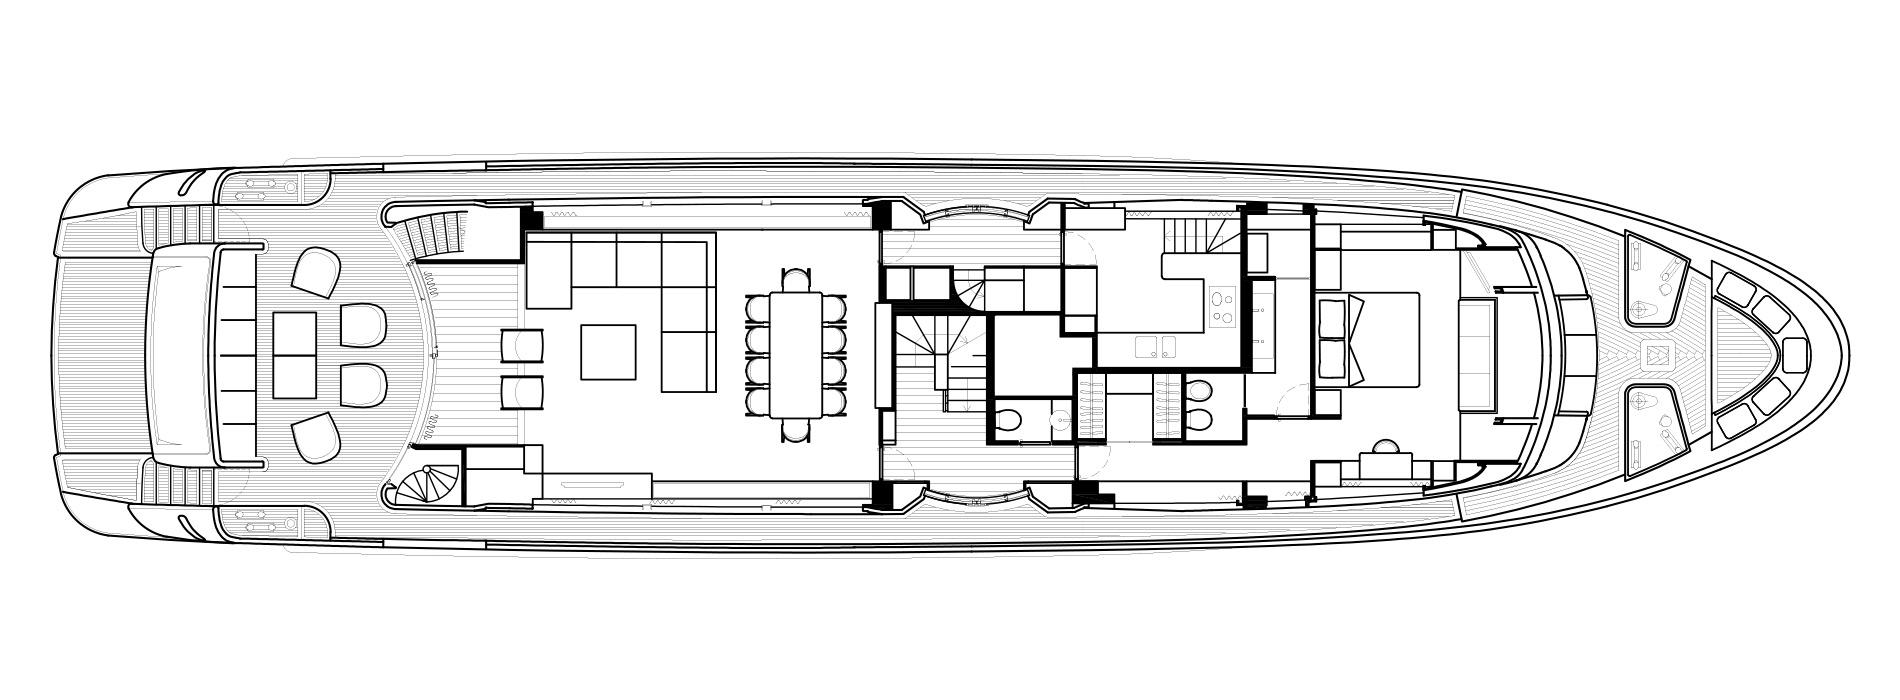 Sanlorenzo Yachts SD112 Hauptdeck Versione A